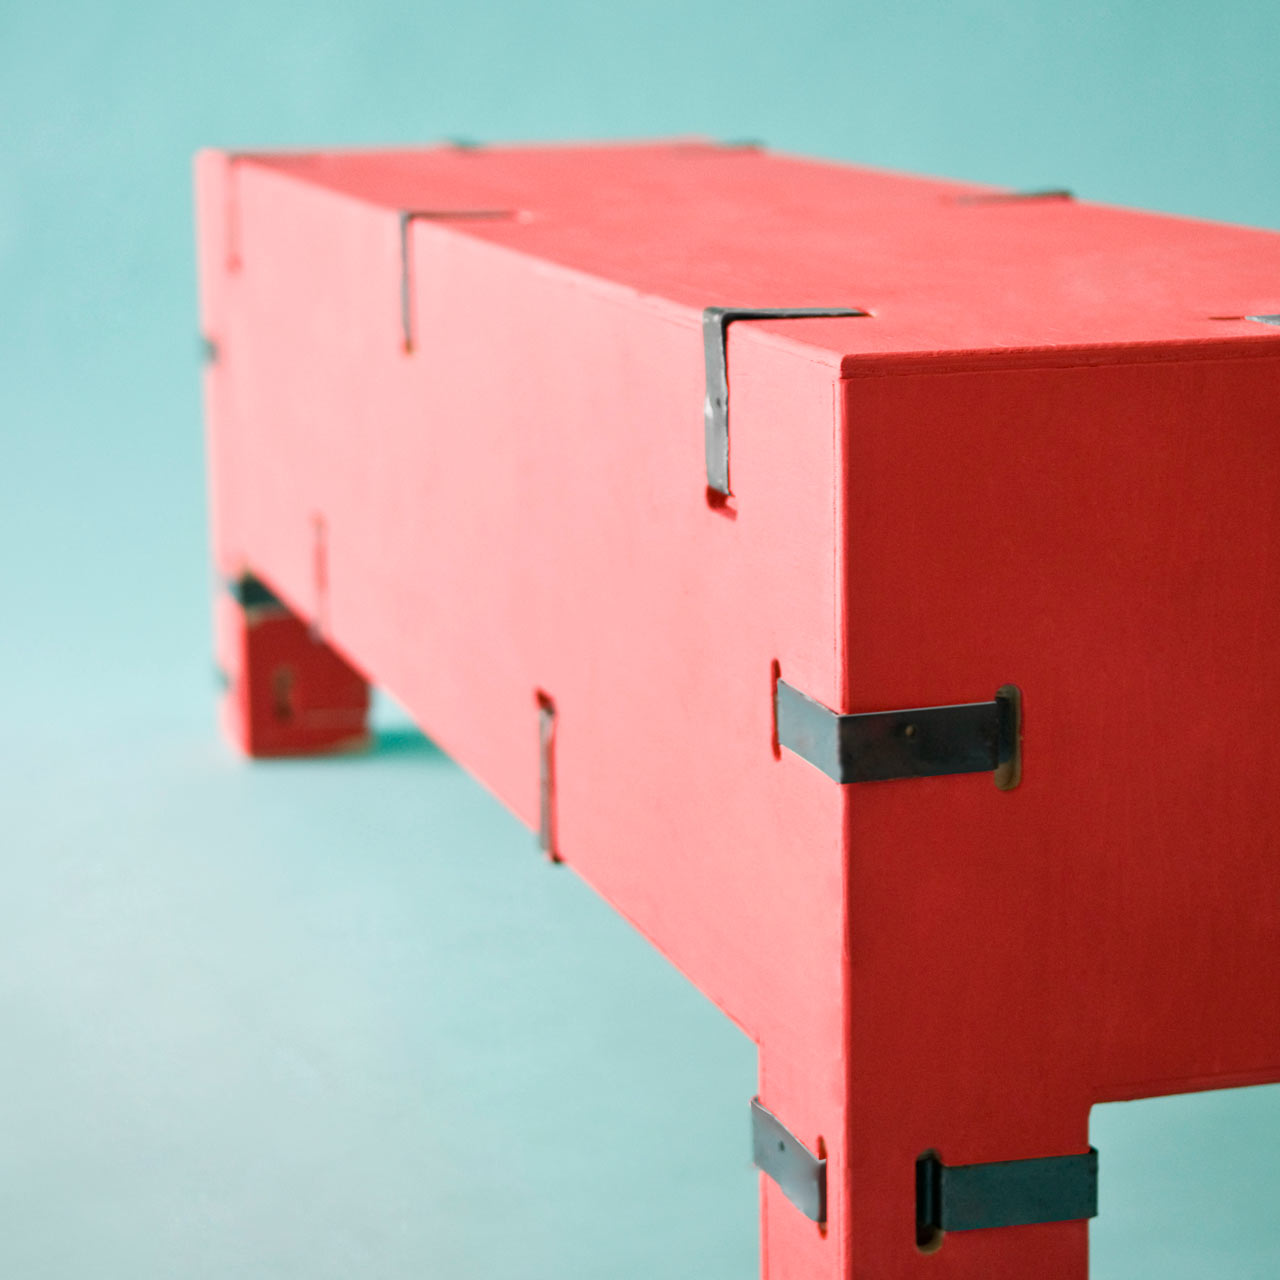 Pakiet-Modular-Furniture-hisheji (2)